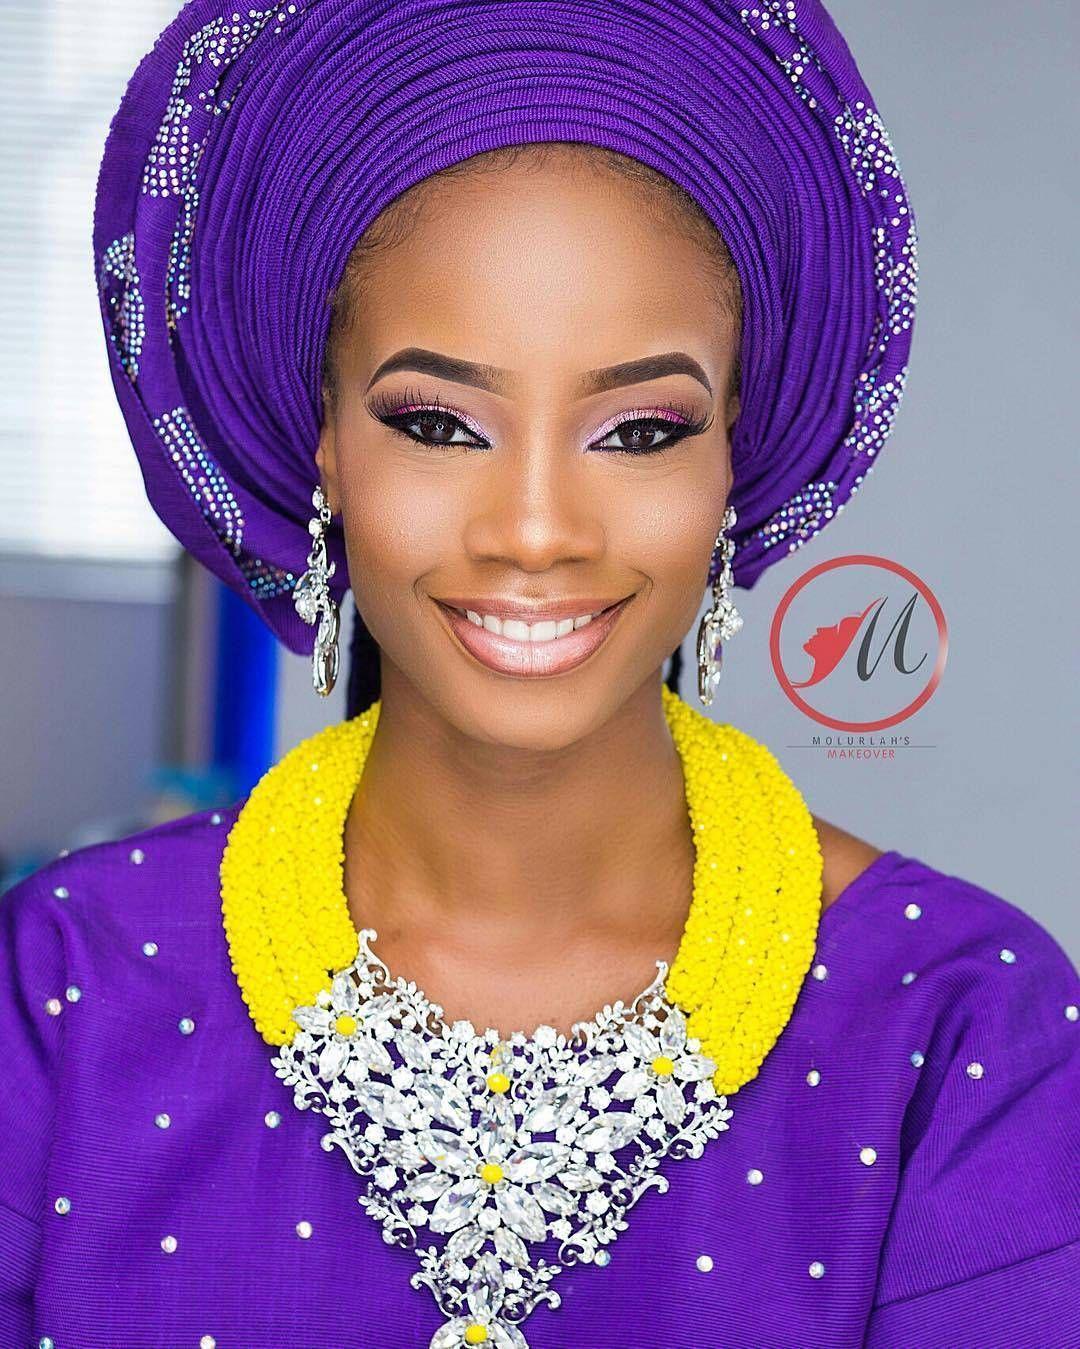 ⚜lovely ⚜ Makeup by @molurlahsmakeover  Beads by @rochem_iyaileke Asooke by @asookebyt  Model @_a.adrian  Repost @BellaNaijaWeddings #naijabestmua #cleanbeat #lash #love #beautiful #promua #smile #pretty #nude #cuteeyes #flawless #awesomeness #freshface #beauty #naijabestmua #beauty  #makeup #fotd #eotd #amrezy #anastasiabeverlyhills  #vegasnay #makeupjunkie #makeupartist  #blackkbombshells #melanin #bellanaijaweddings  #melaninbeauties #melaningirls #makeupforblackwomen #hudabeauty #w...